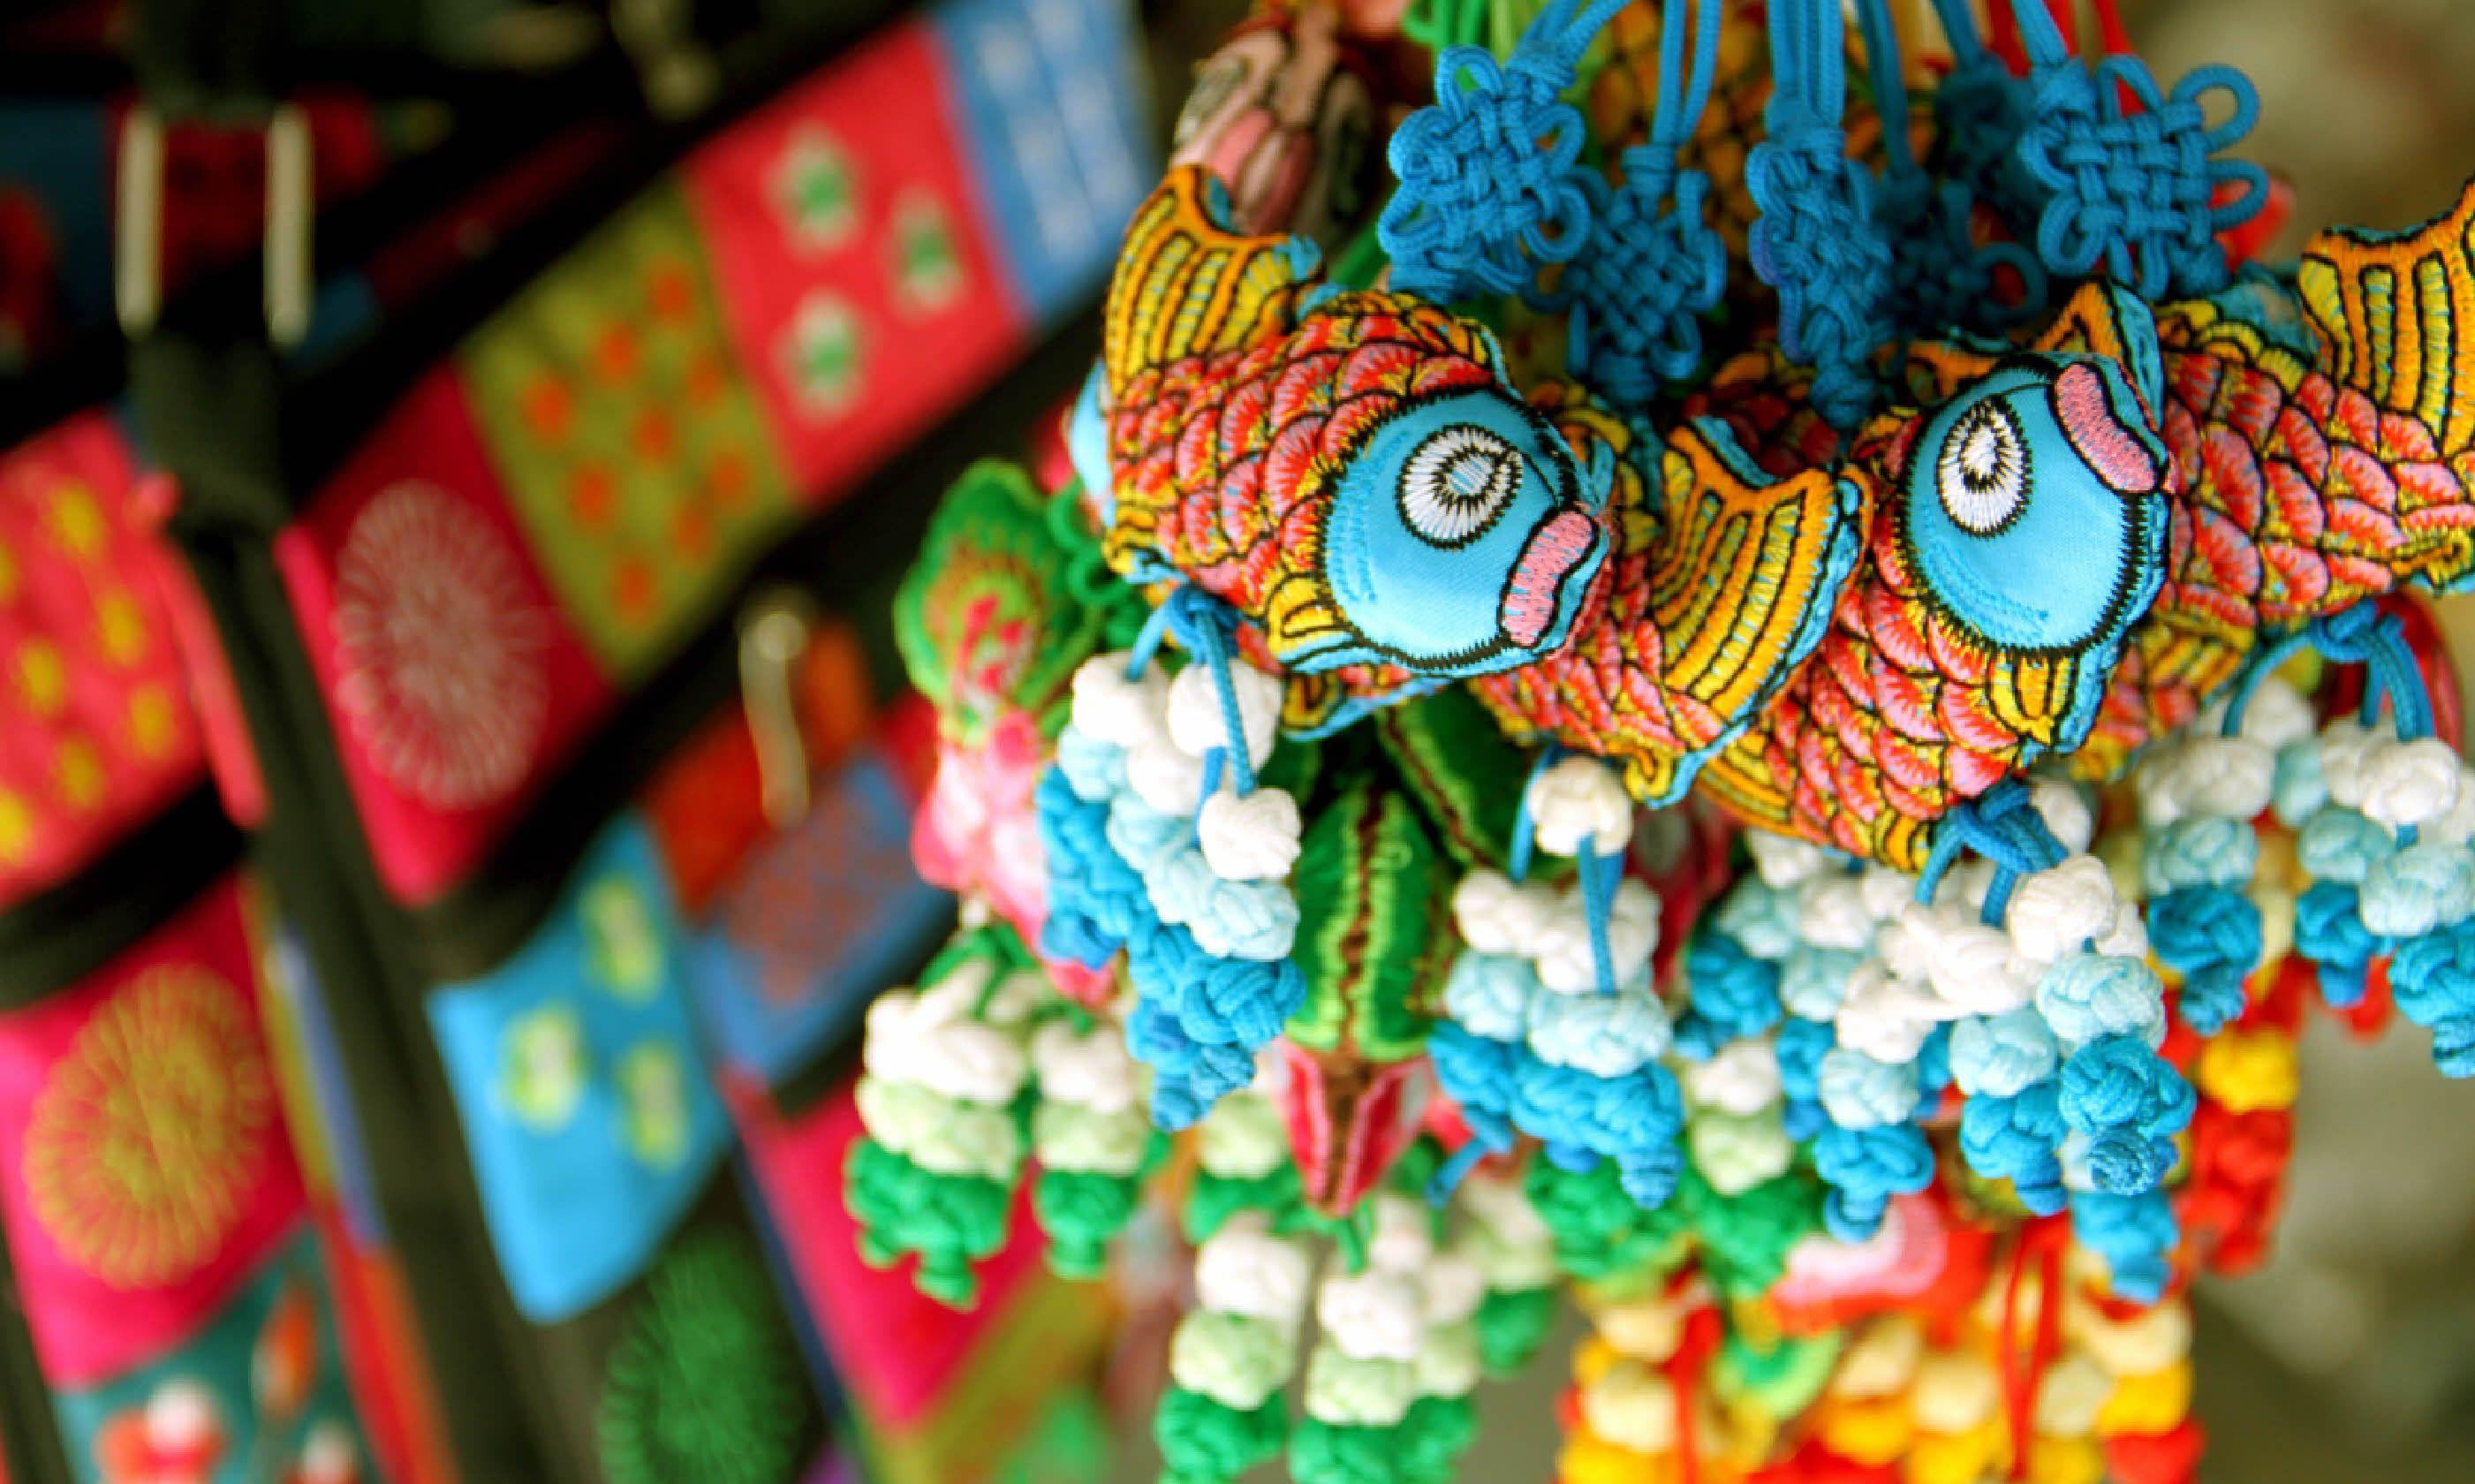 Souvenirs at market in Vietnam (Dreamstime)